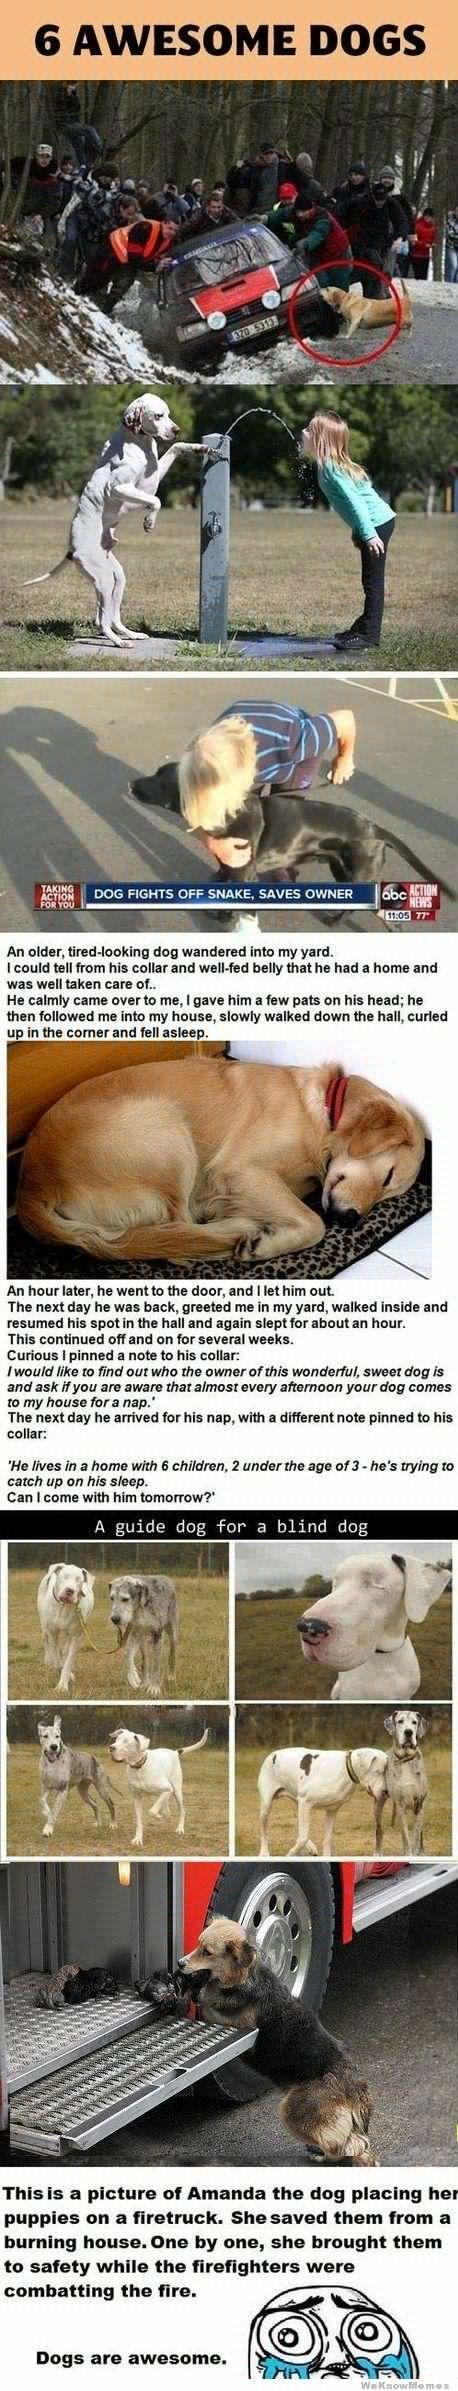 Very cute dog story